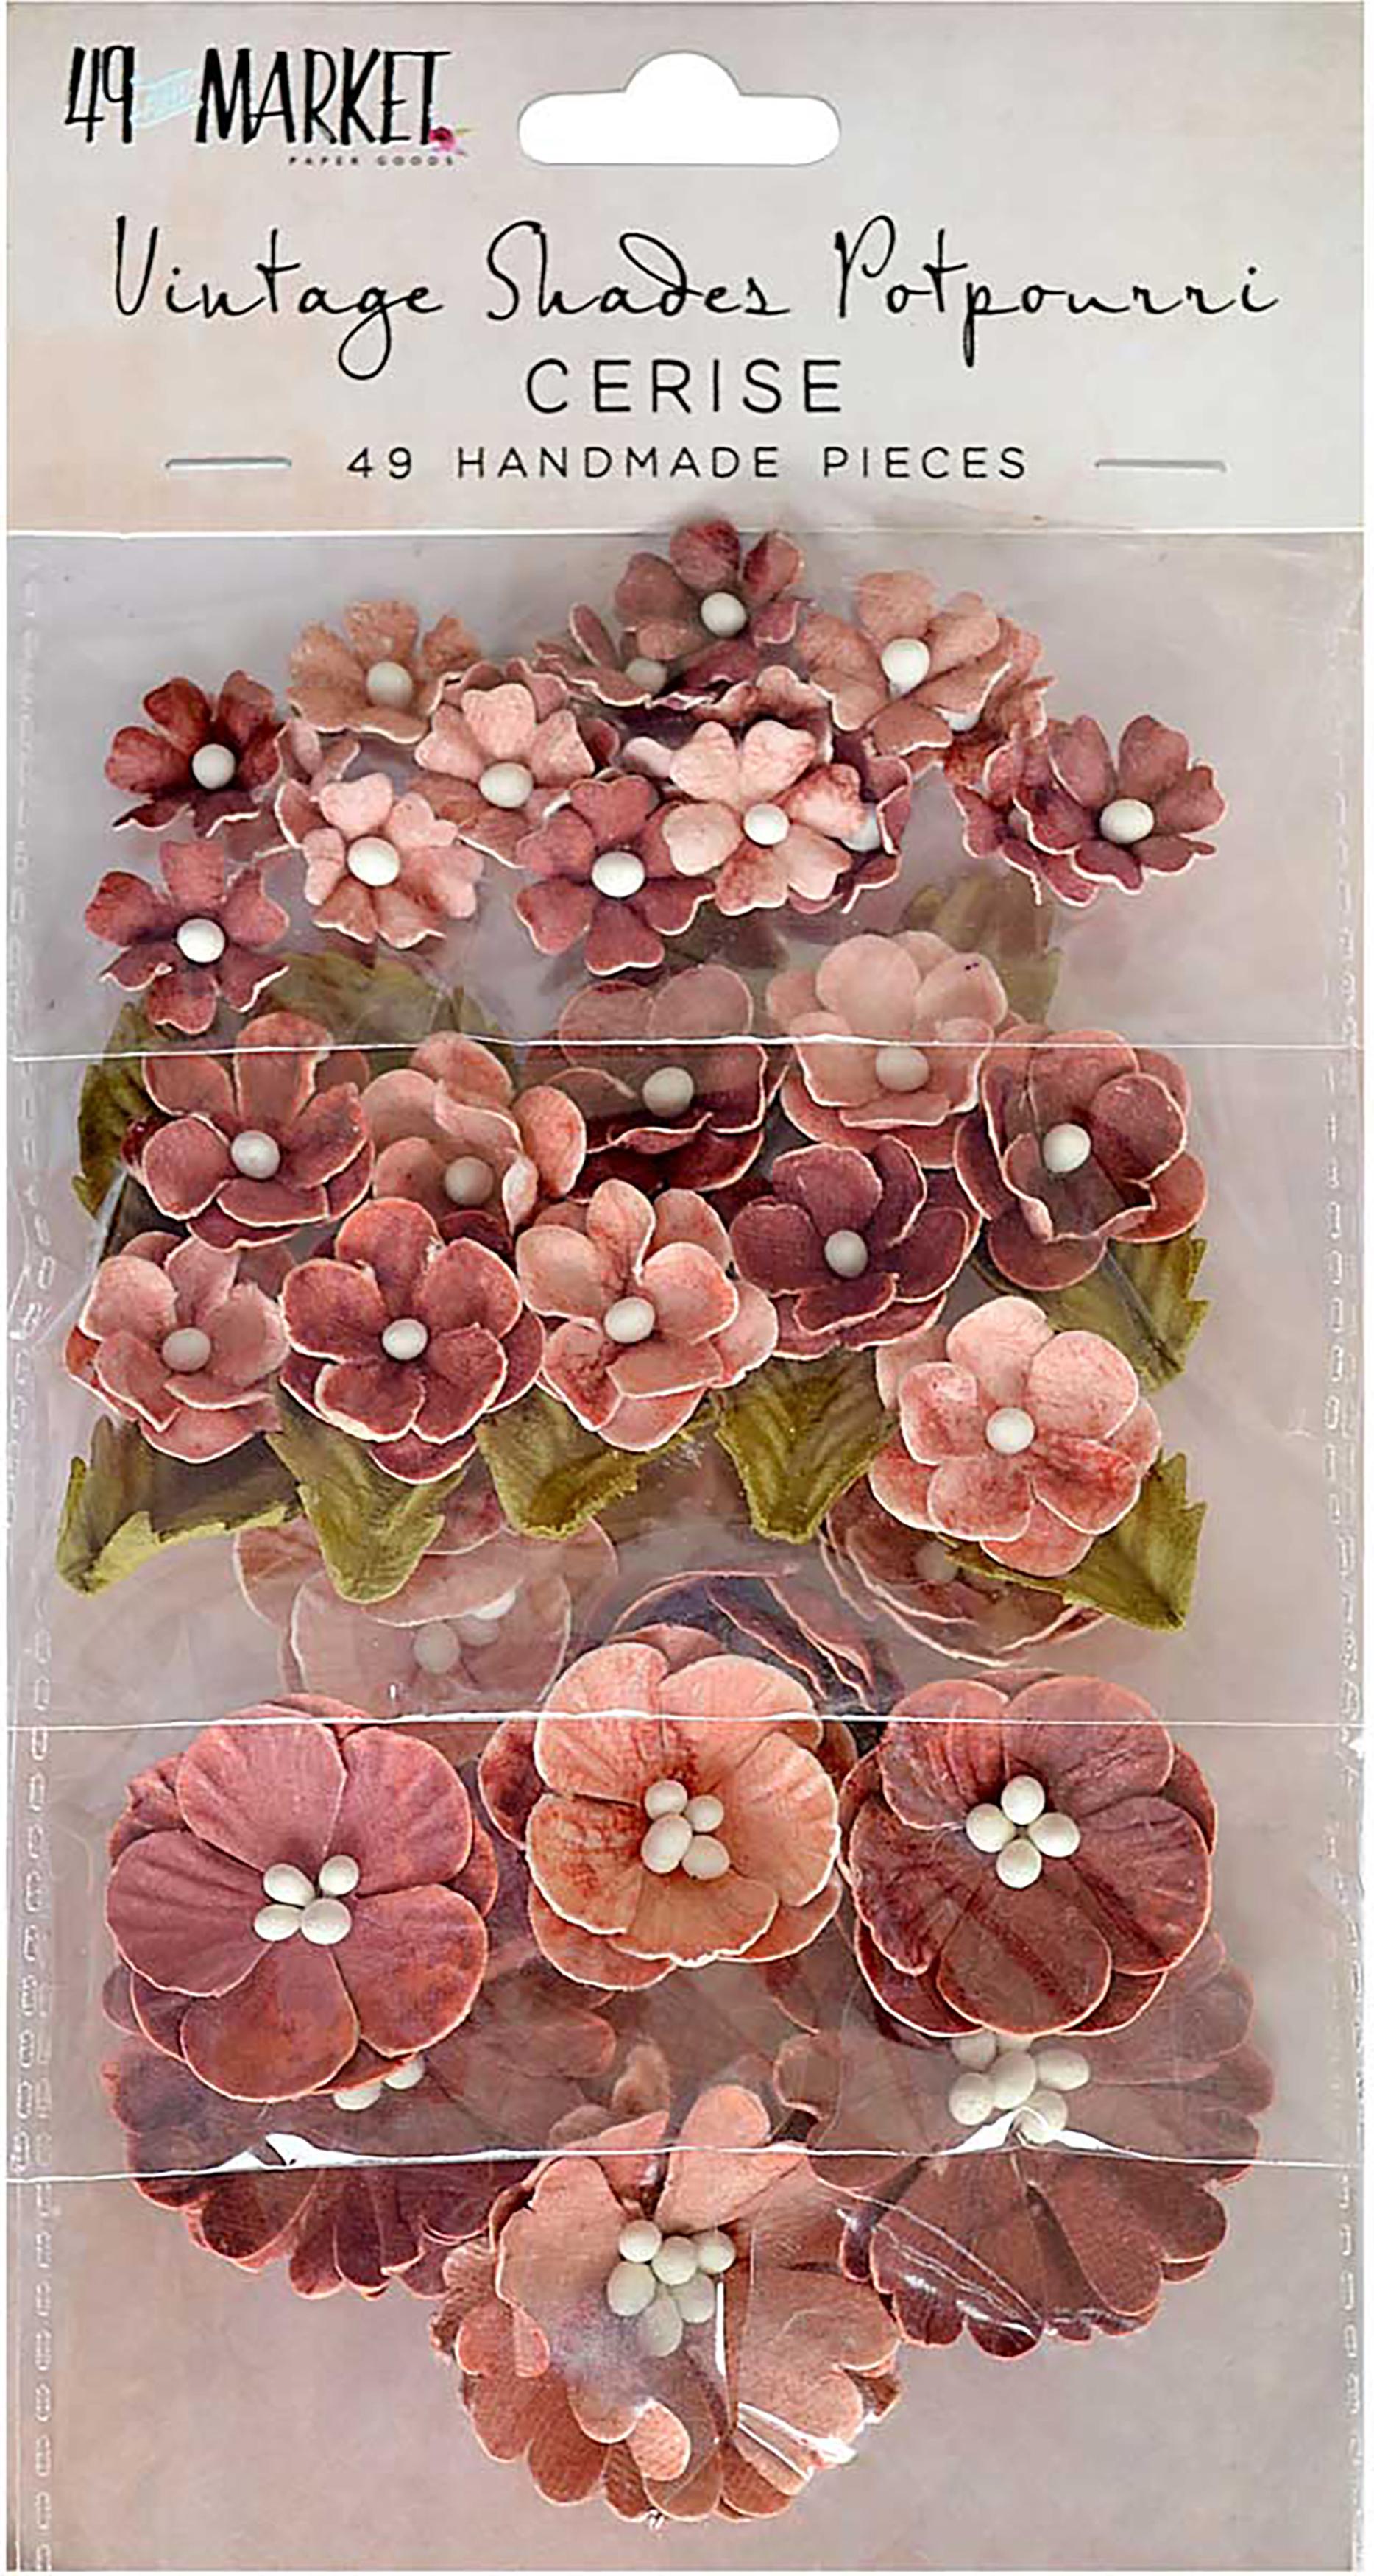 Vintage Shades-Cerise Potpourri